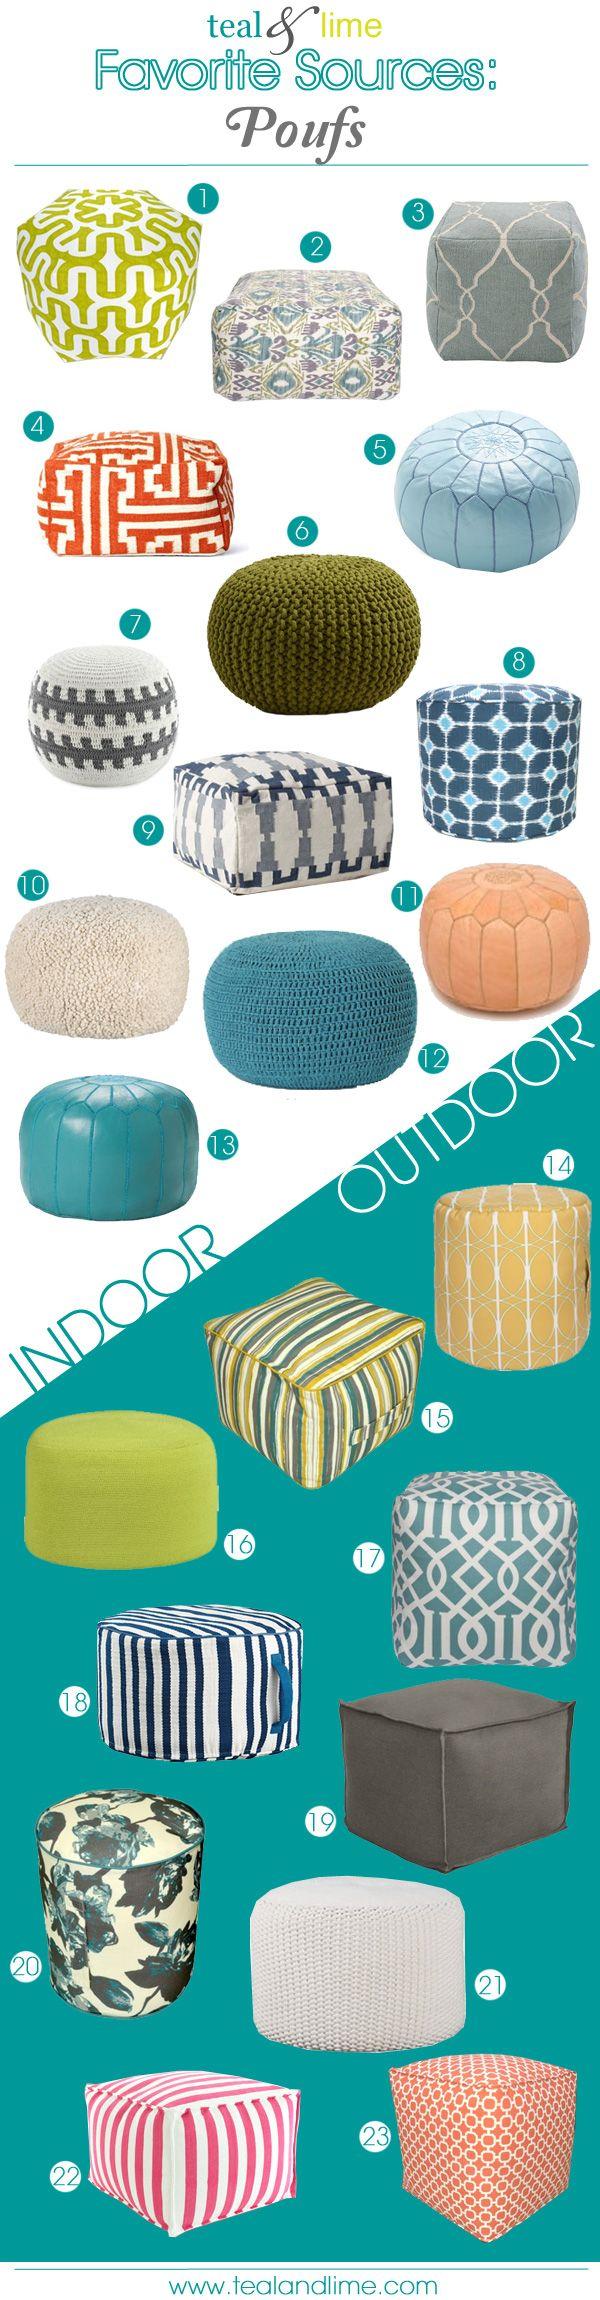 favorite sources for poufs